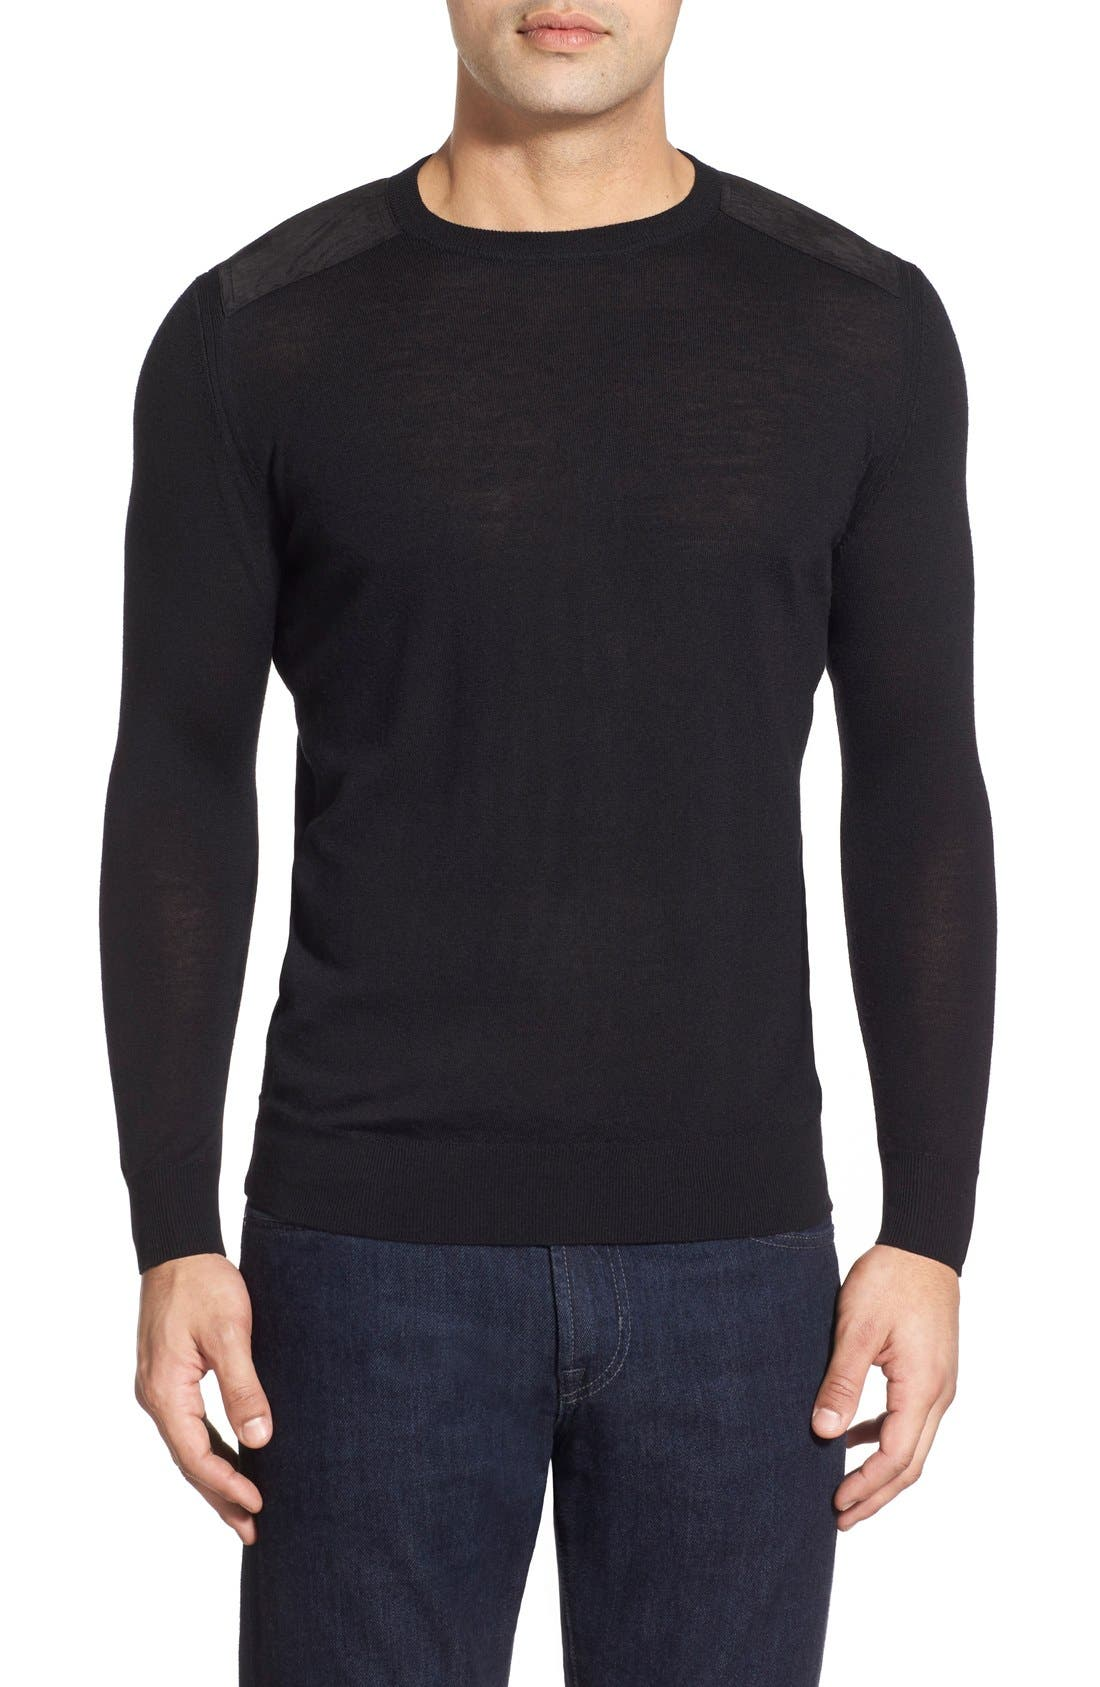 Regular Fit Crewneck Sweater,                         Main,                         color, 001